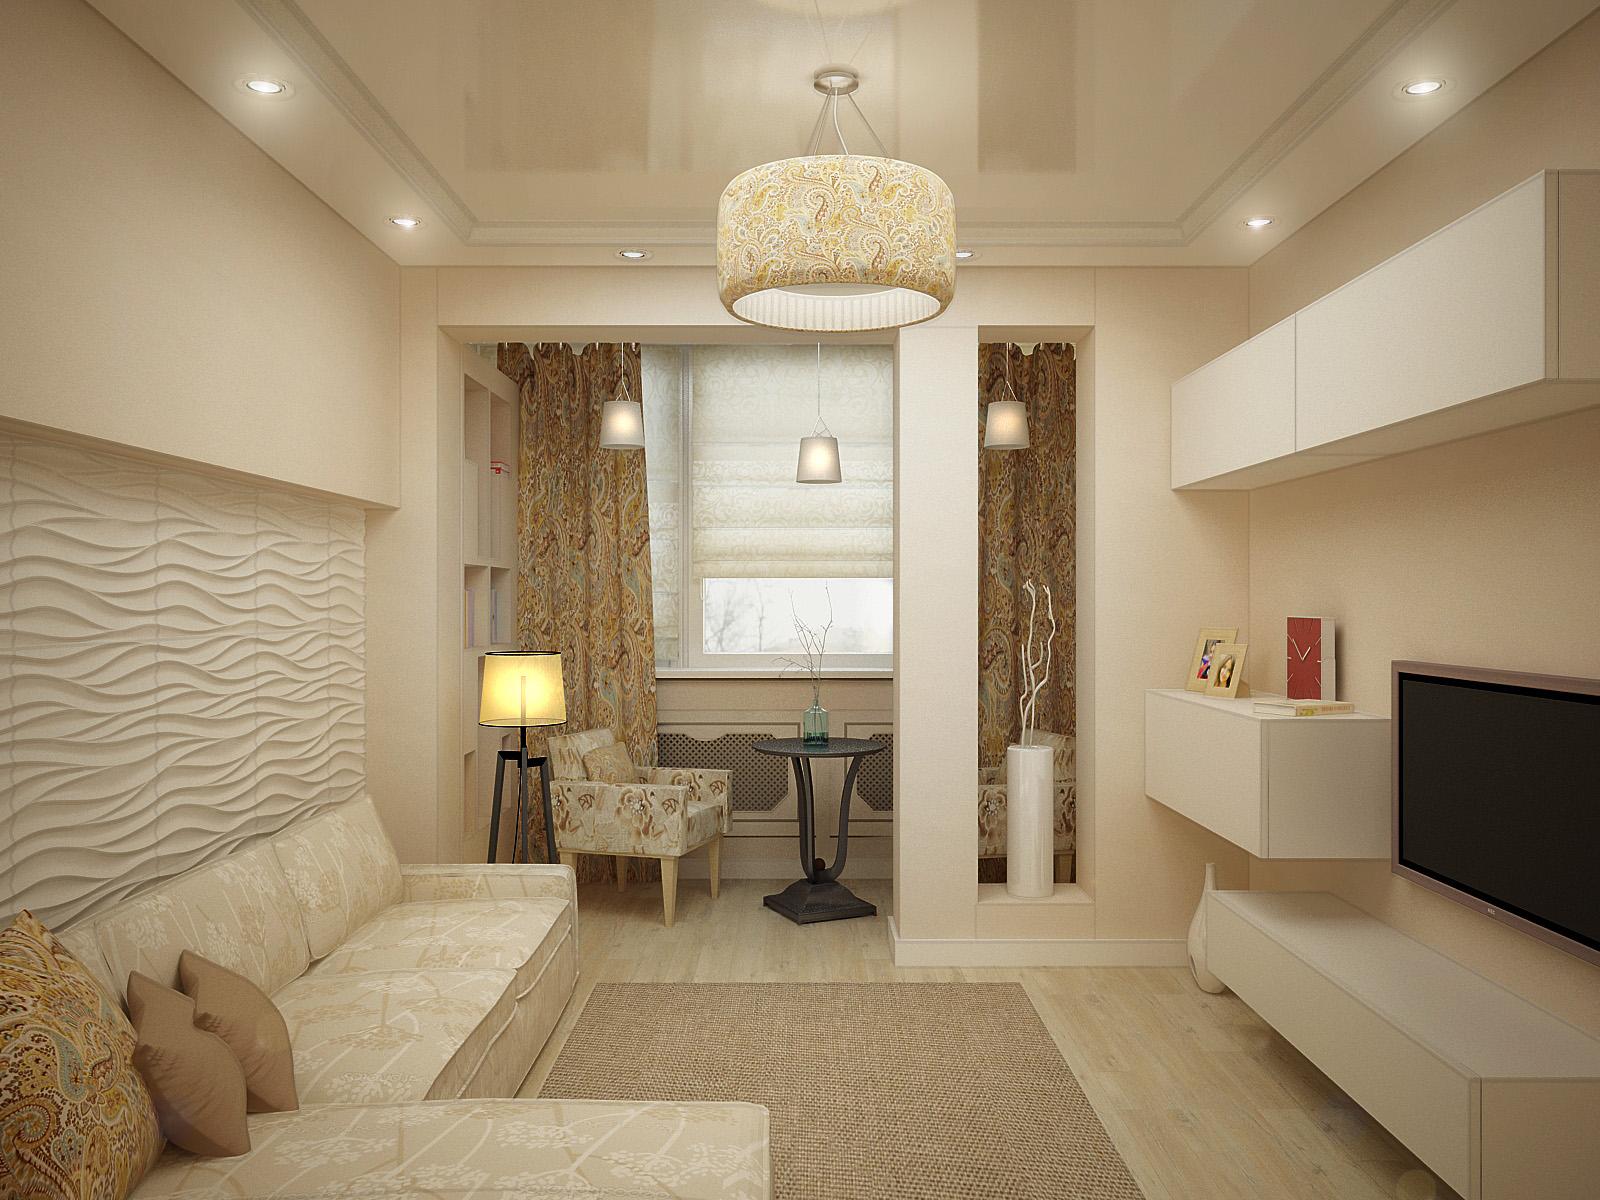 дизайн зала 20 кв м в квартире фото 3